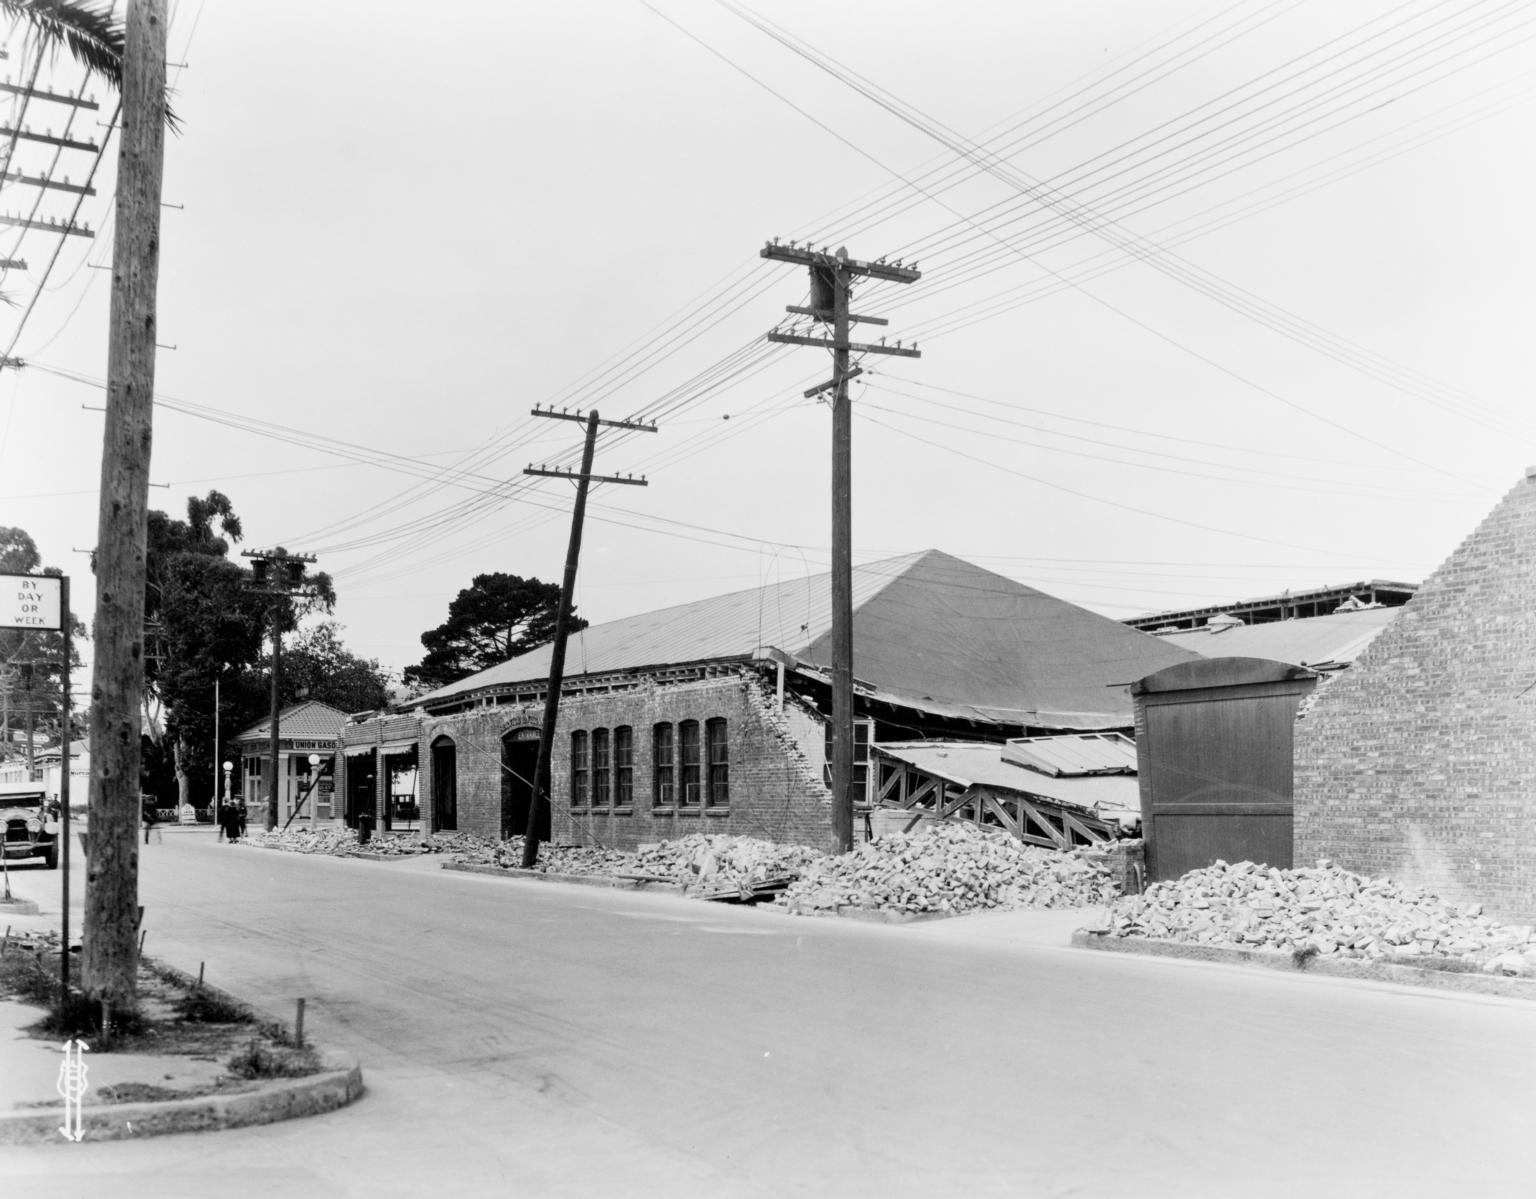 Santa Barbara 1925 Earthquake Damage - Motor Car Company